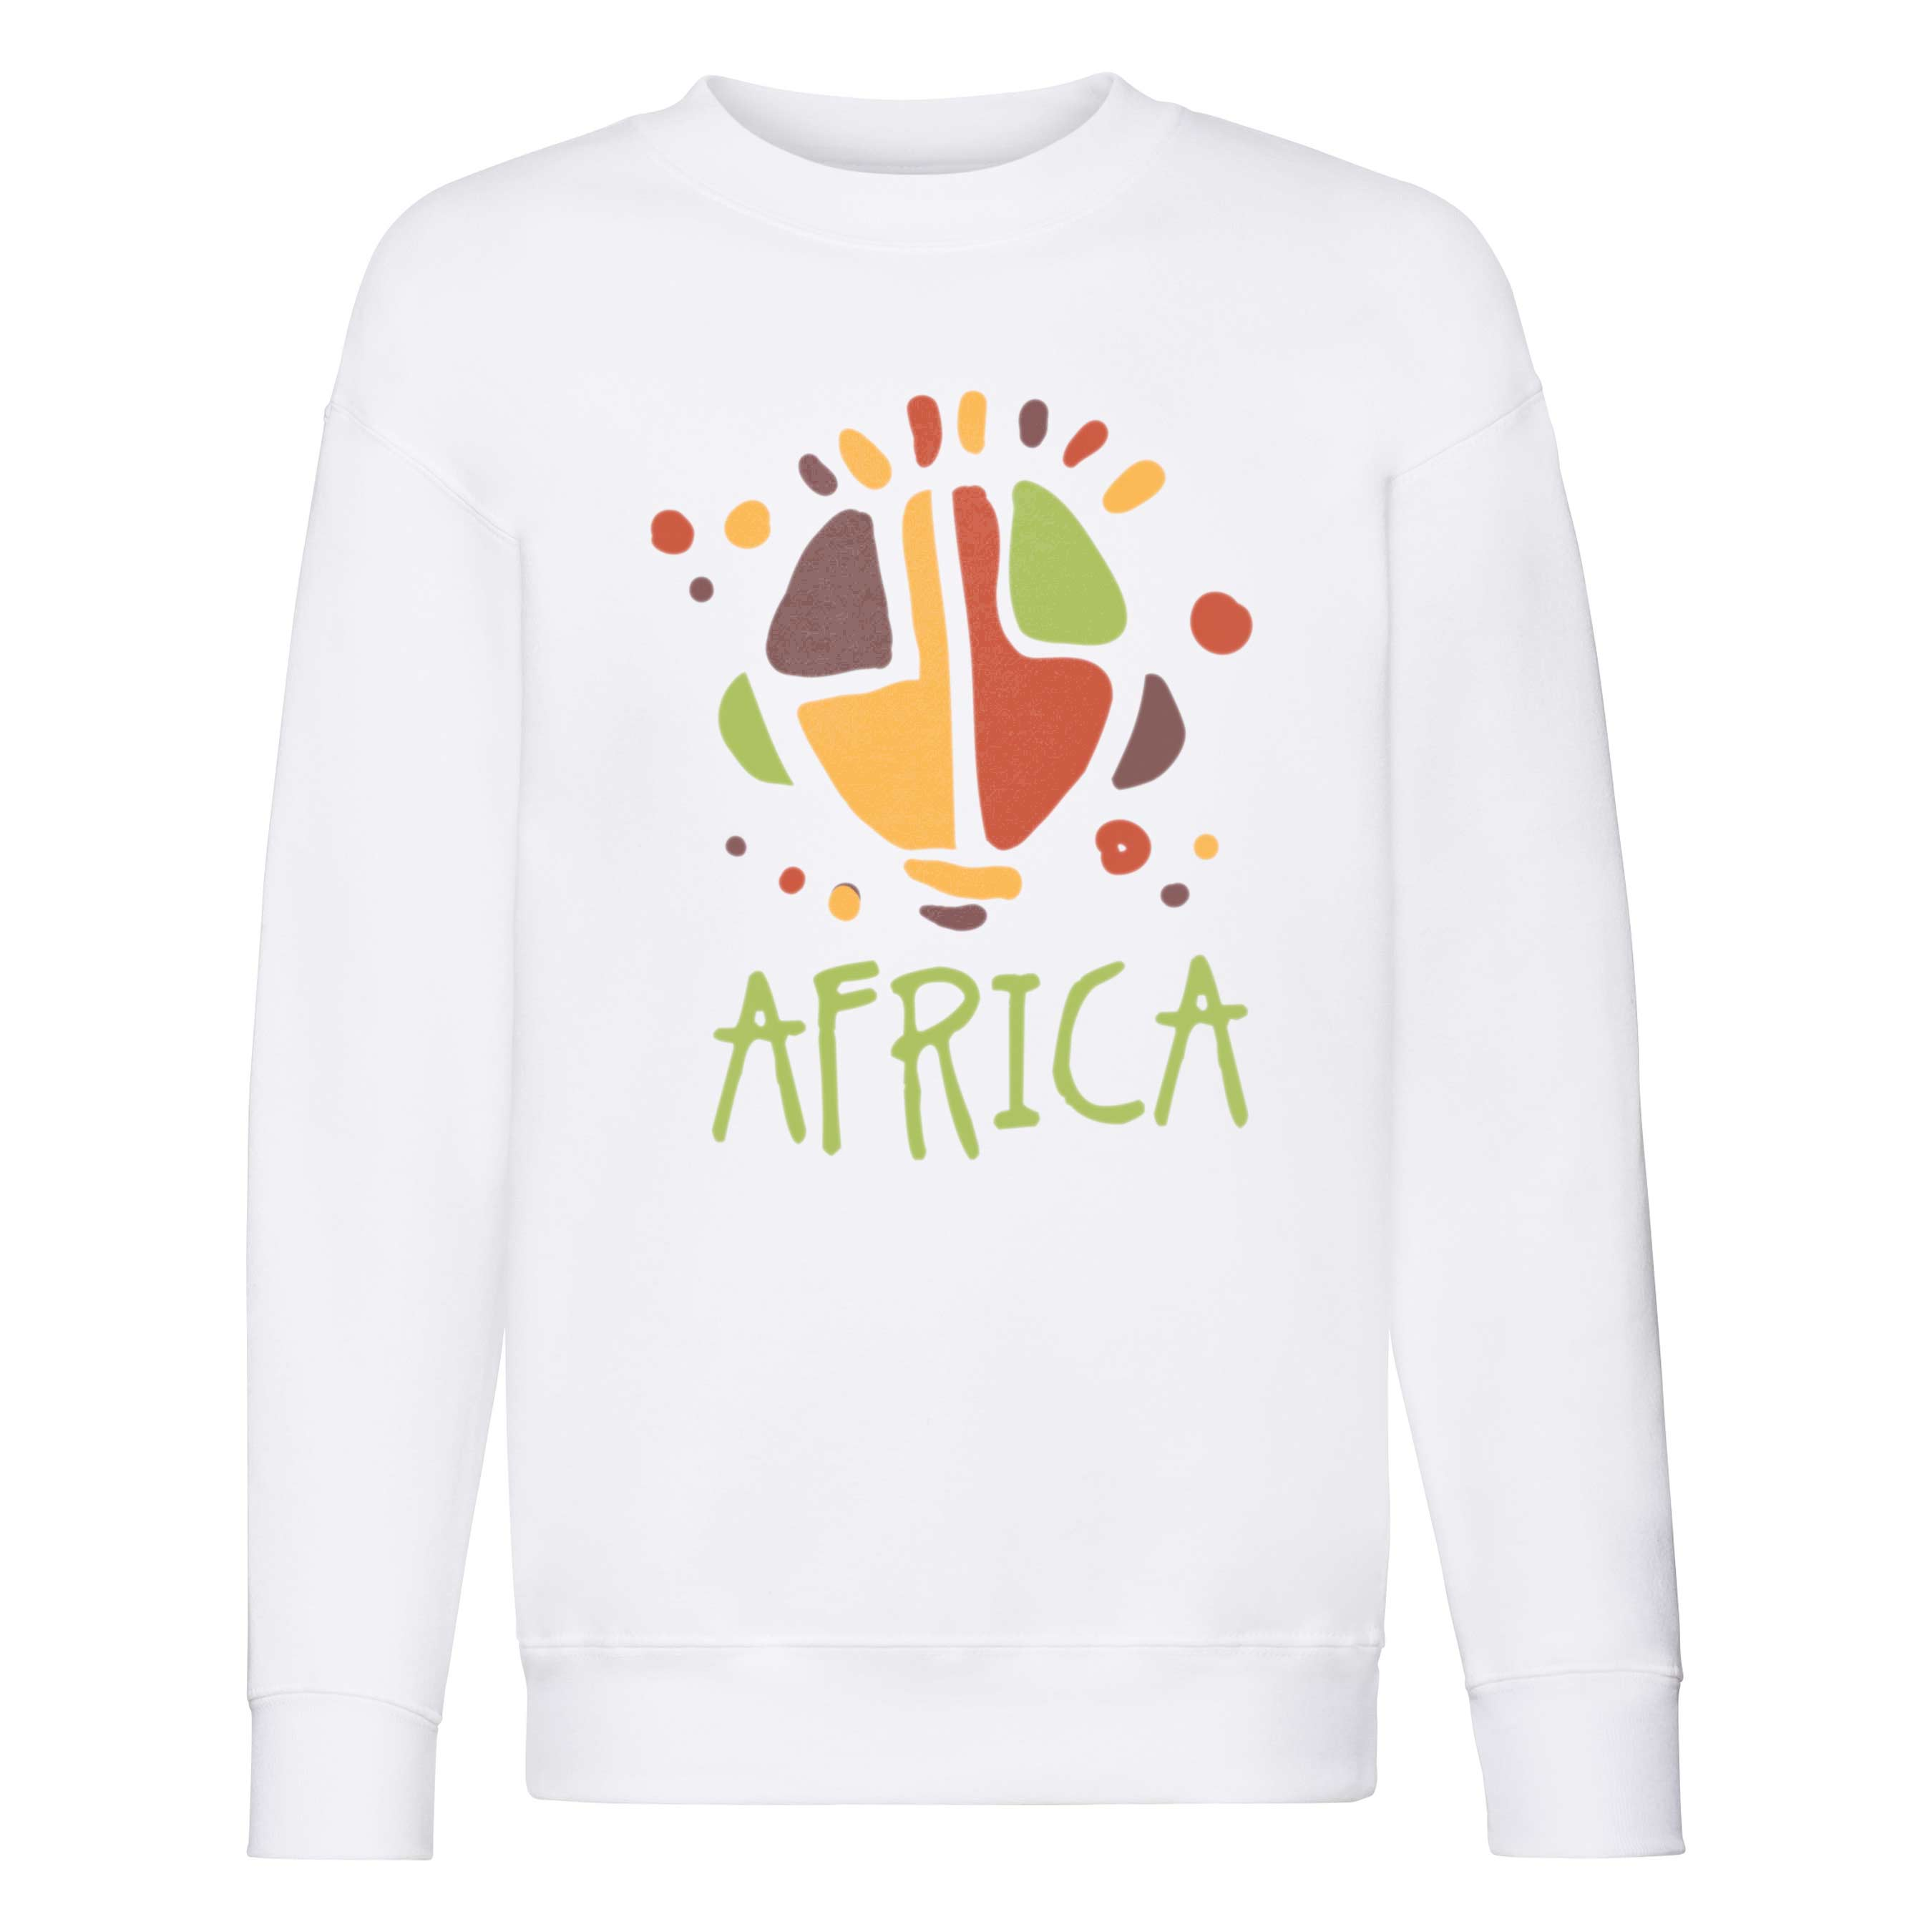 Africa design for t-shirt, hoodie & sweatshirt